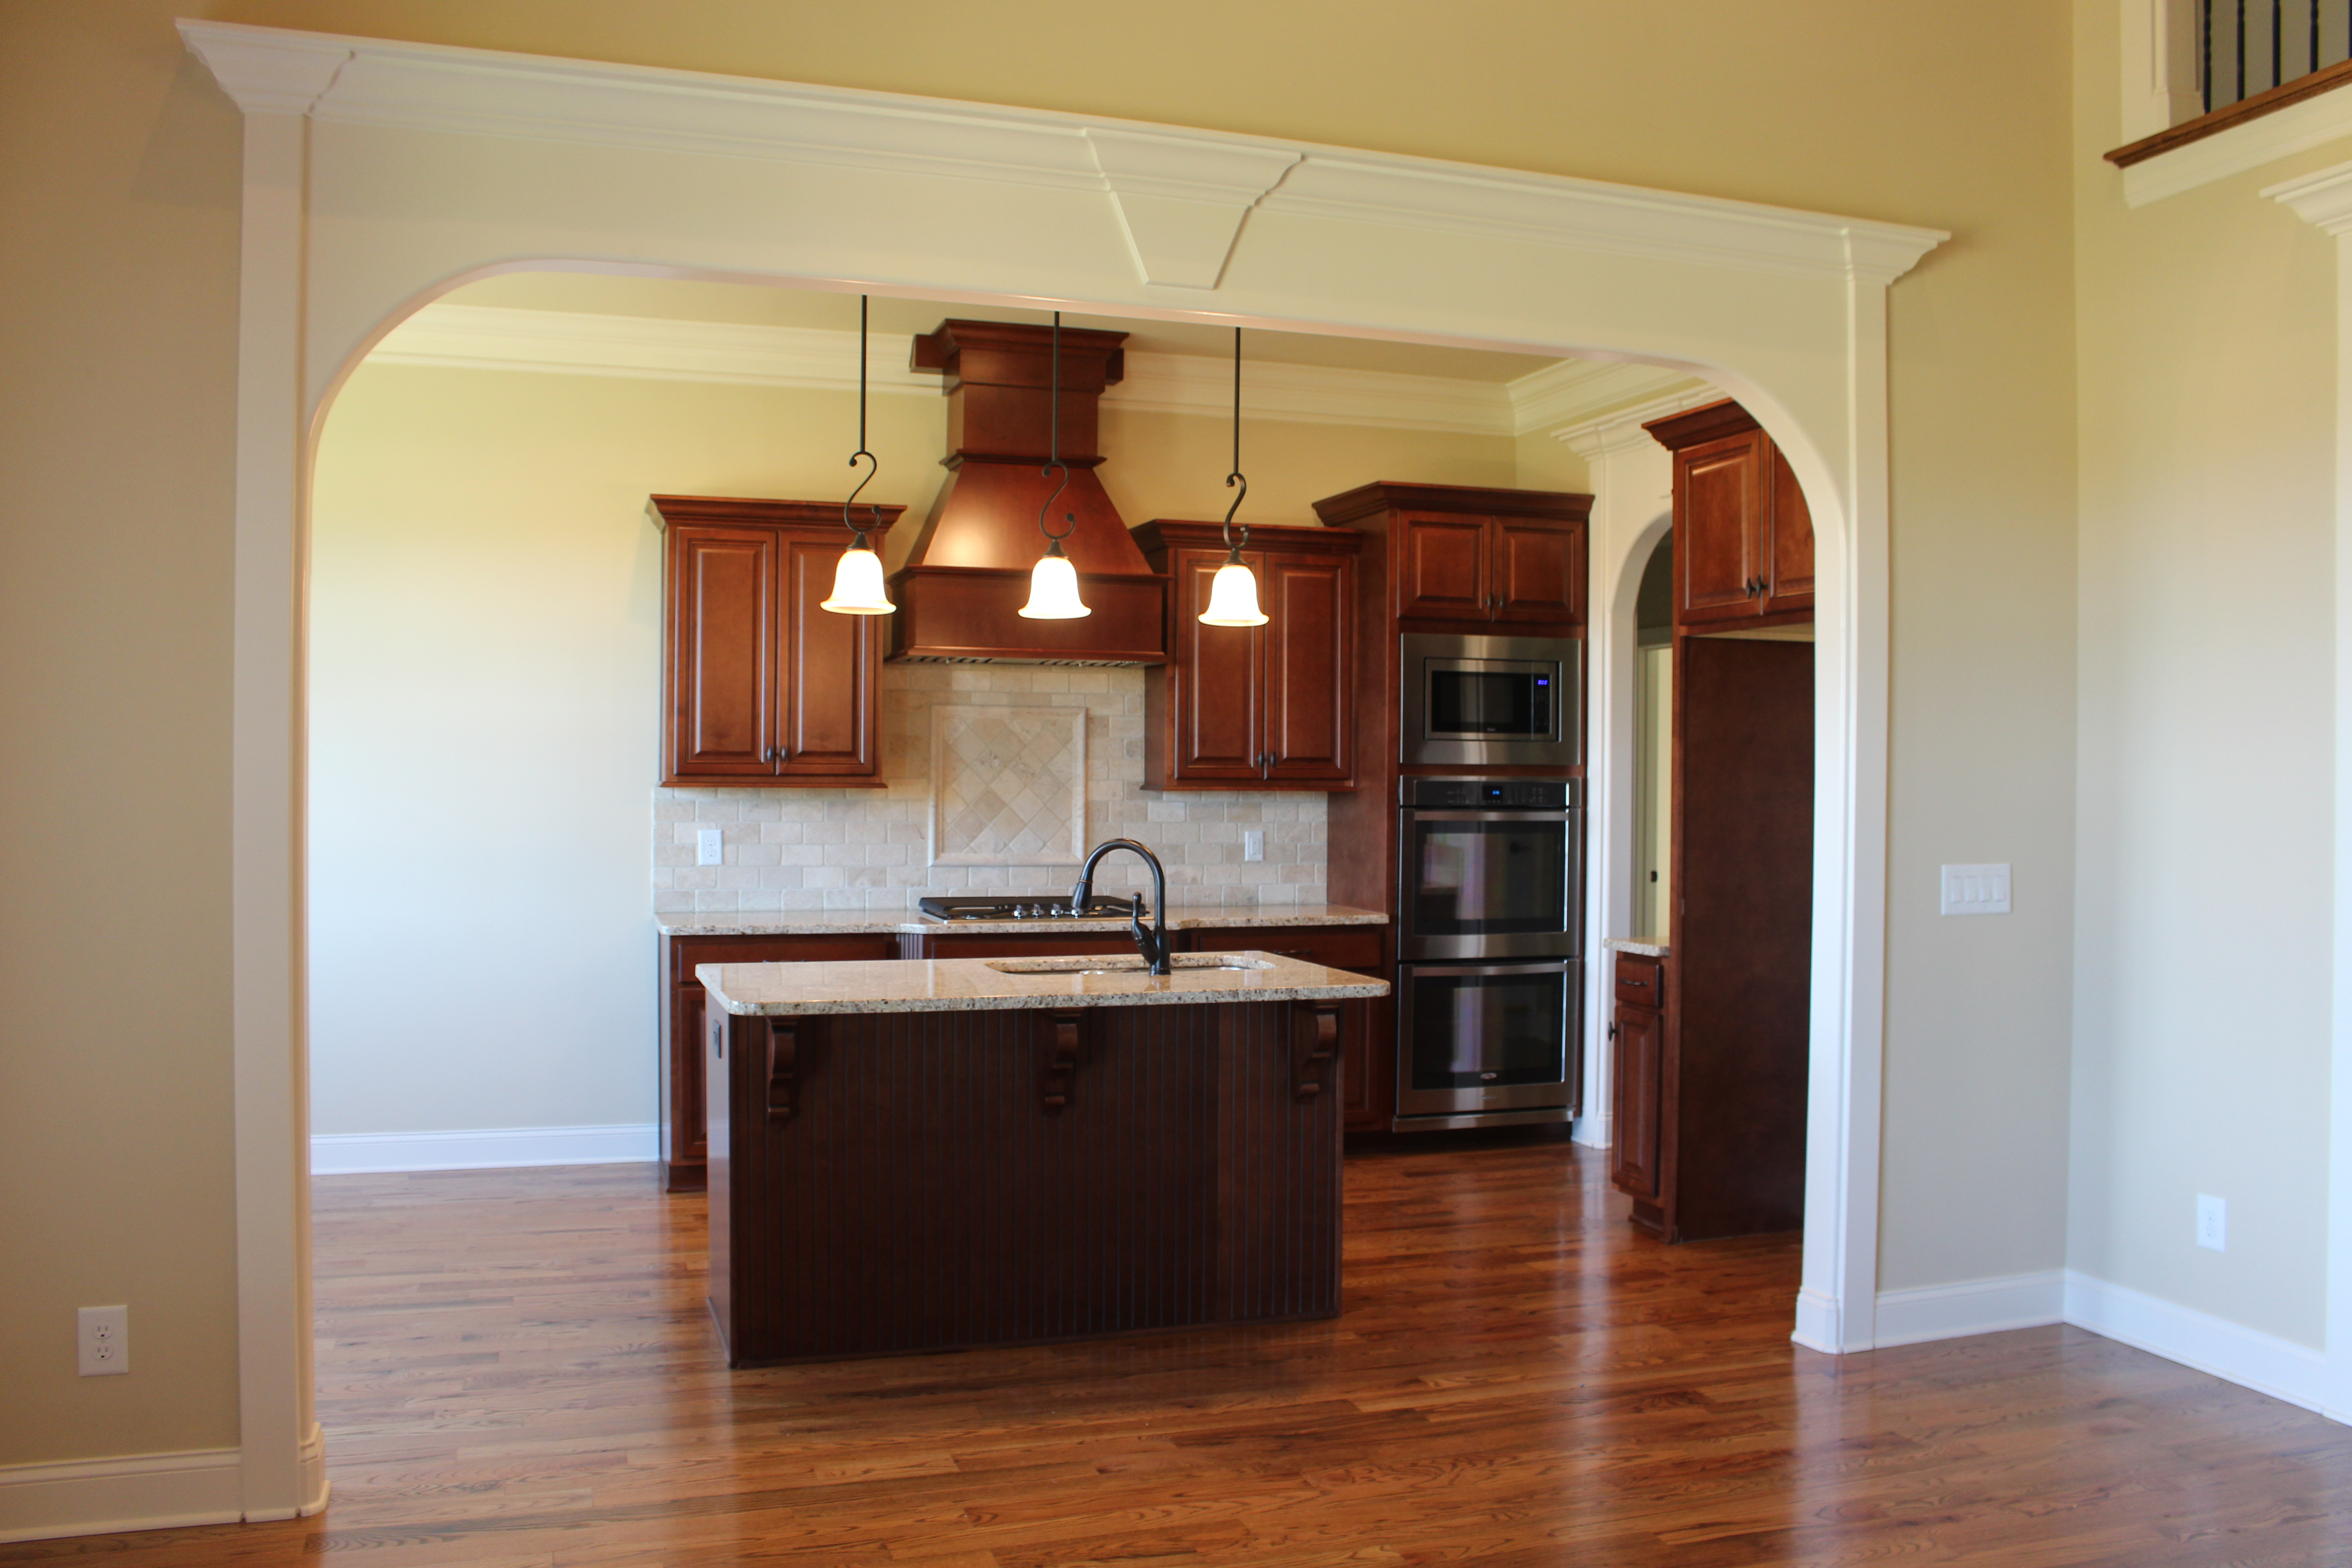 Lot 207 AR kitchen